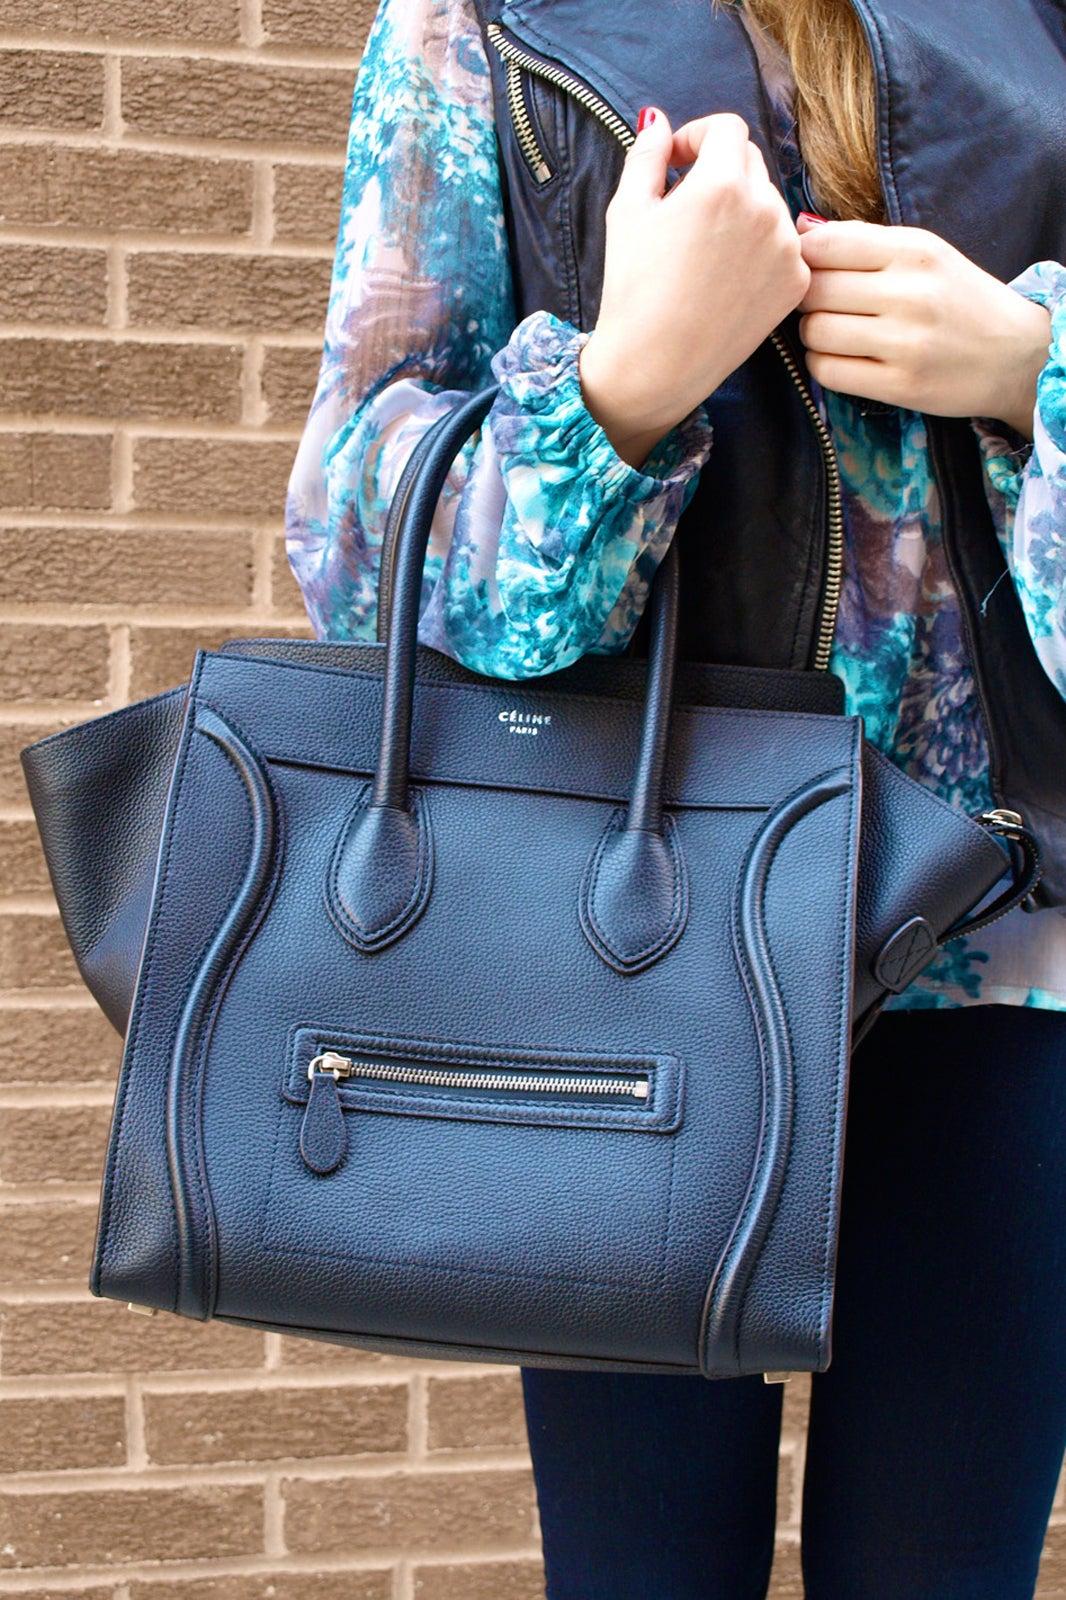 6c0c0852ebb Washington DC Street Style - Designer Handbags